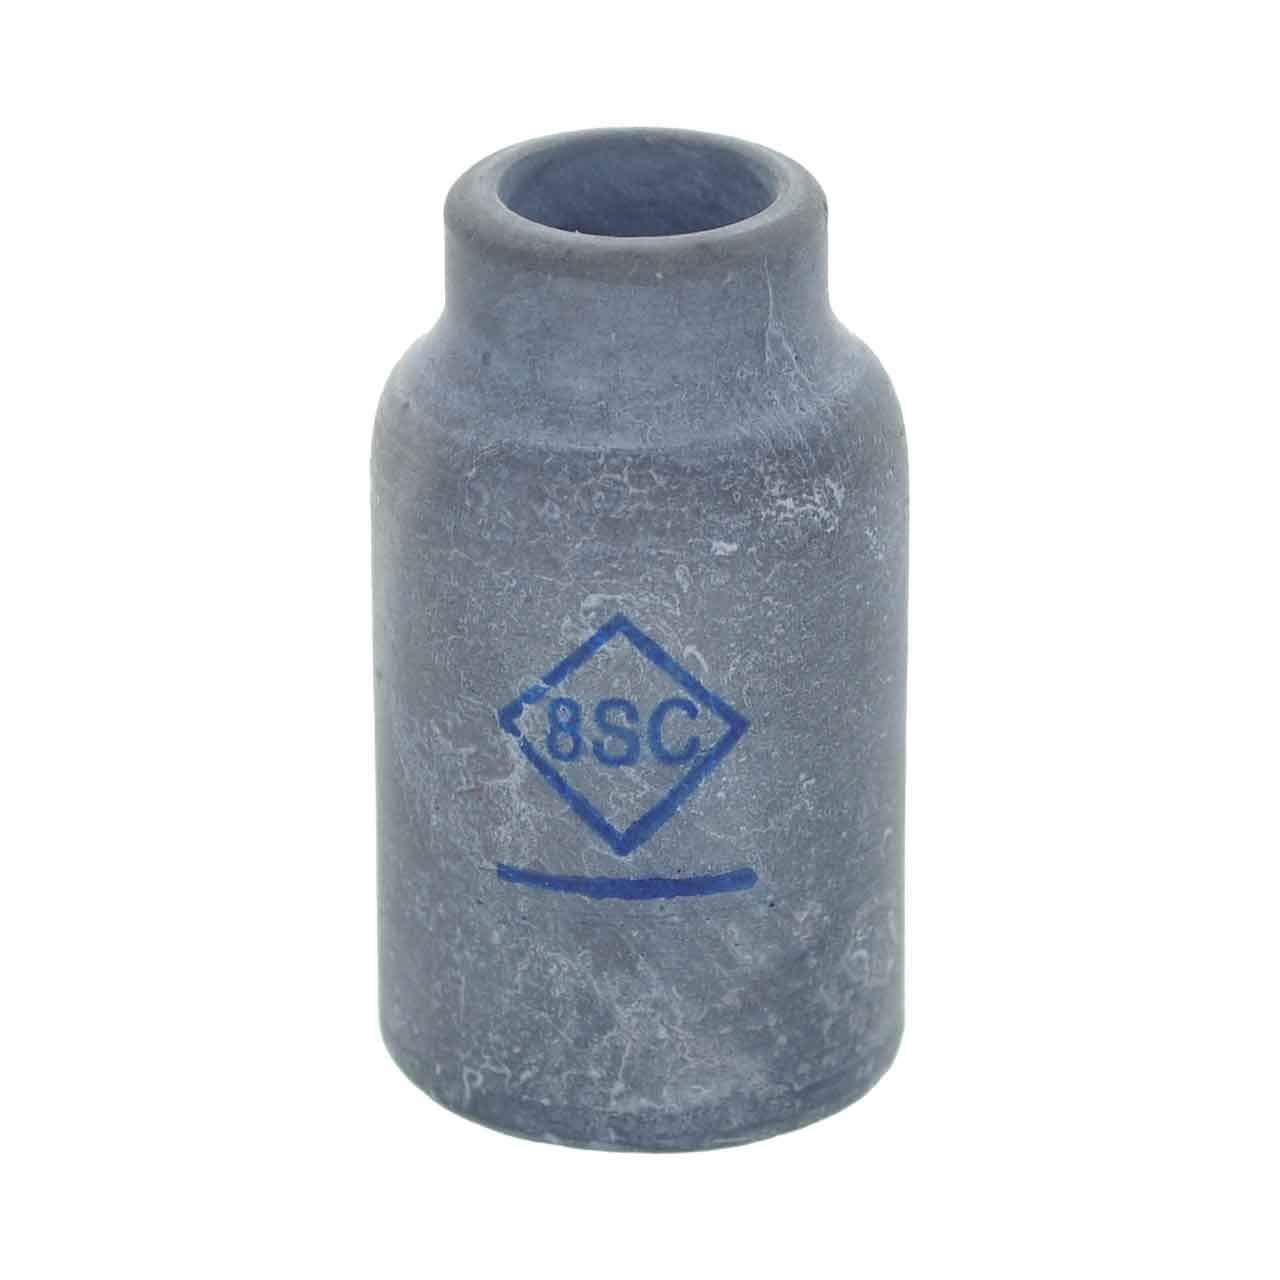 CK 3SG8 Super Cup, Silicone Nitride (1/2'' X 1-5/8'')